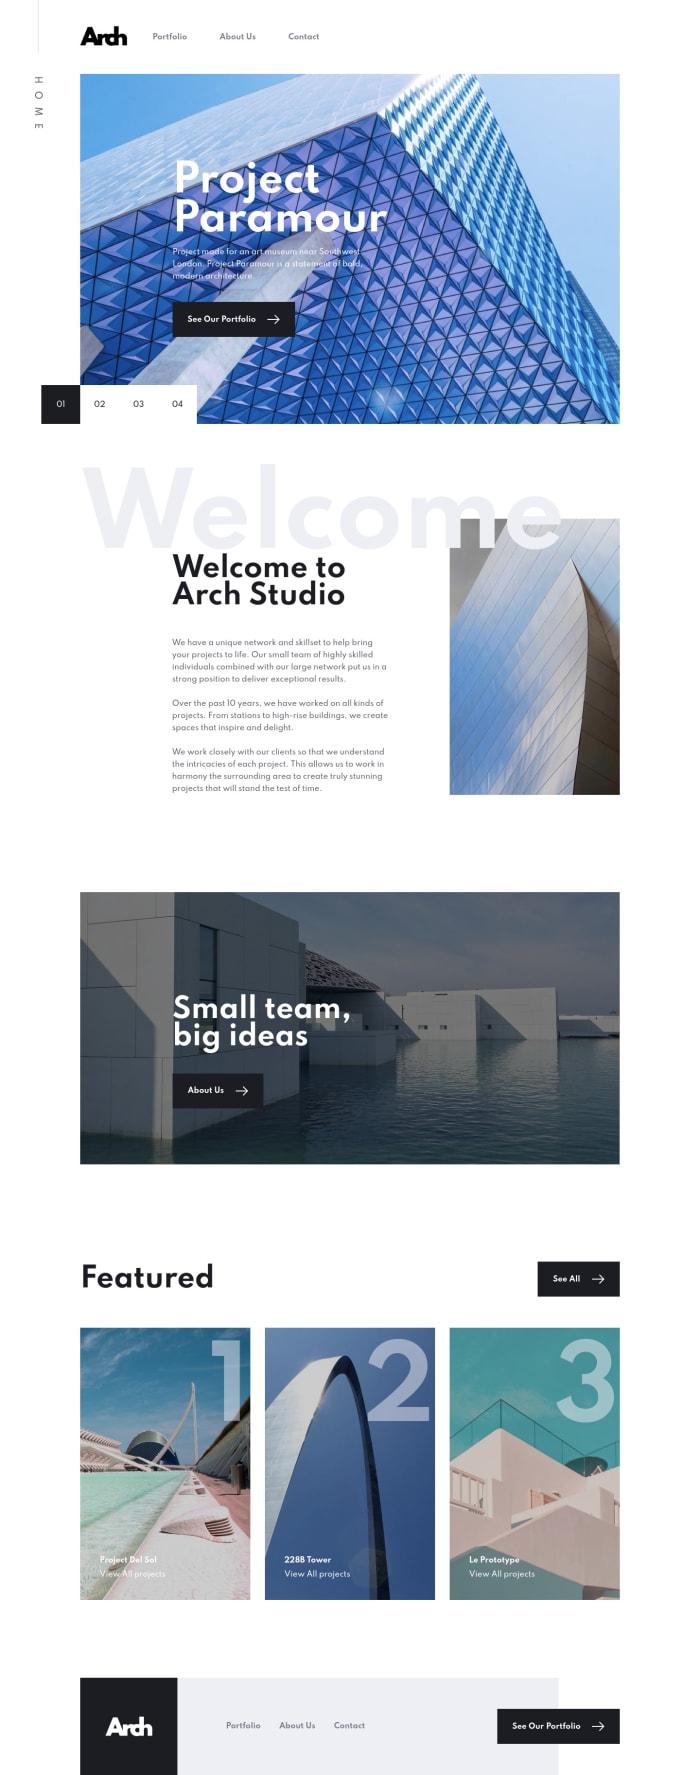 Desktop design screenshot for the Arch Studio multi-page website coding challenge